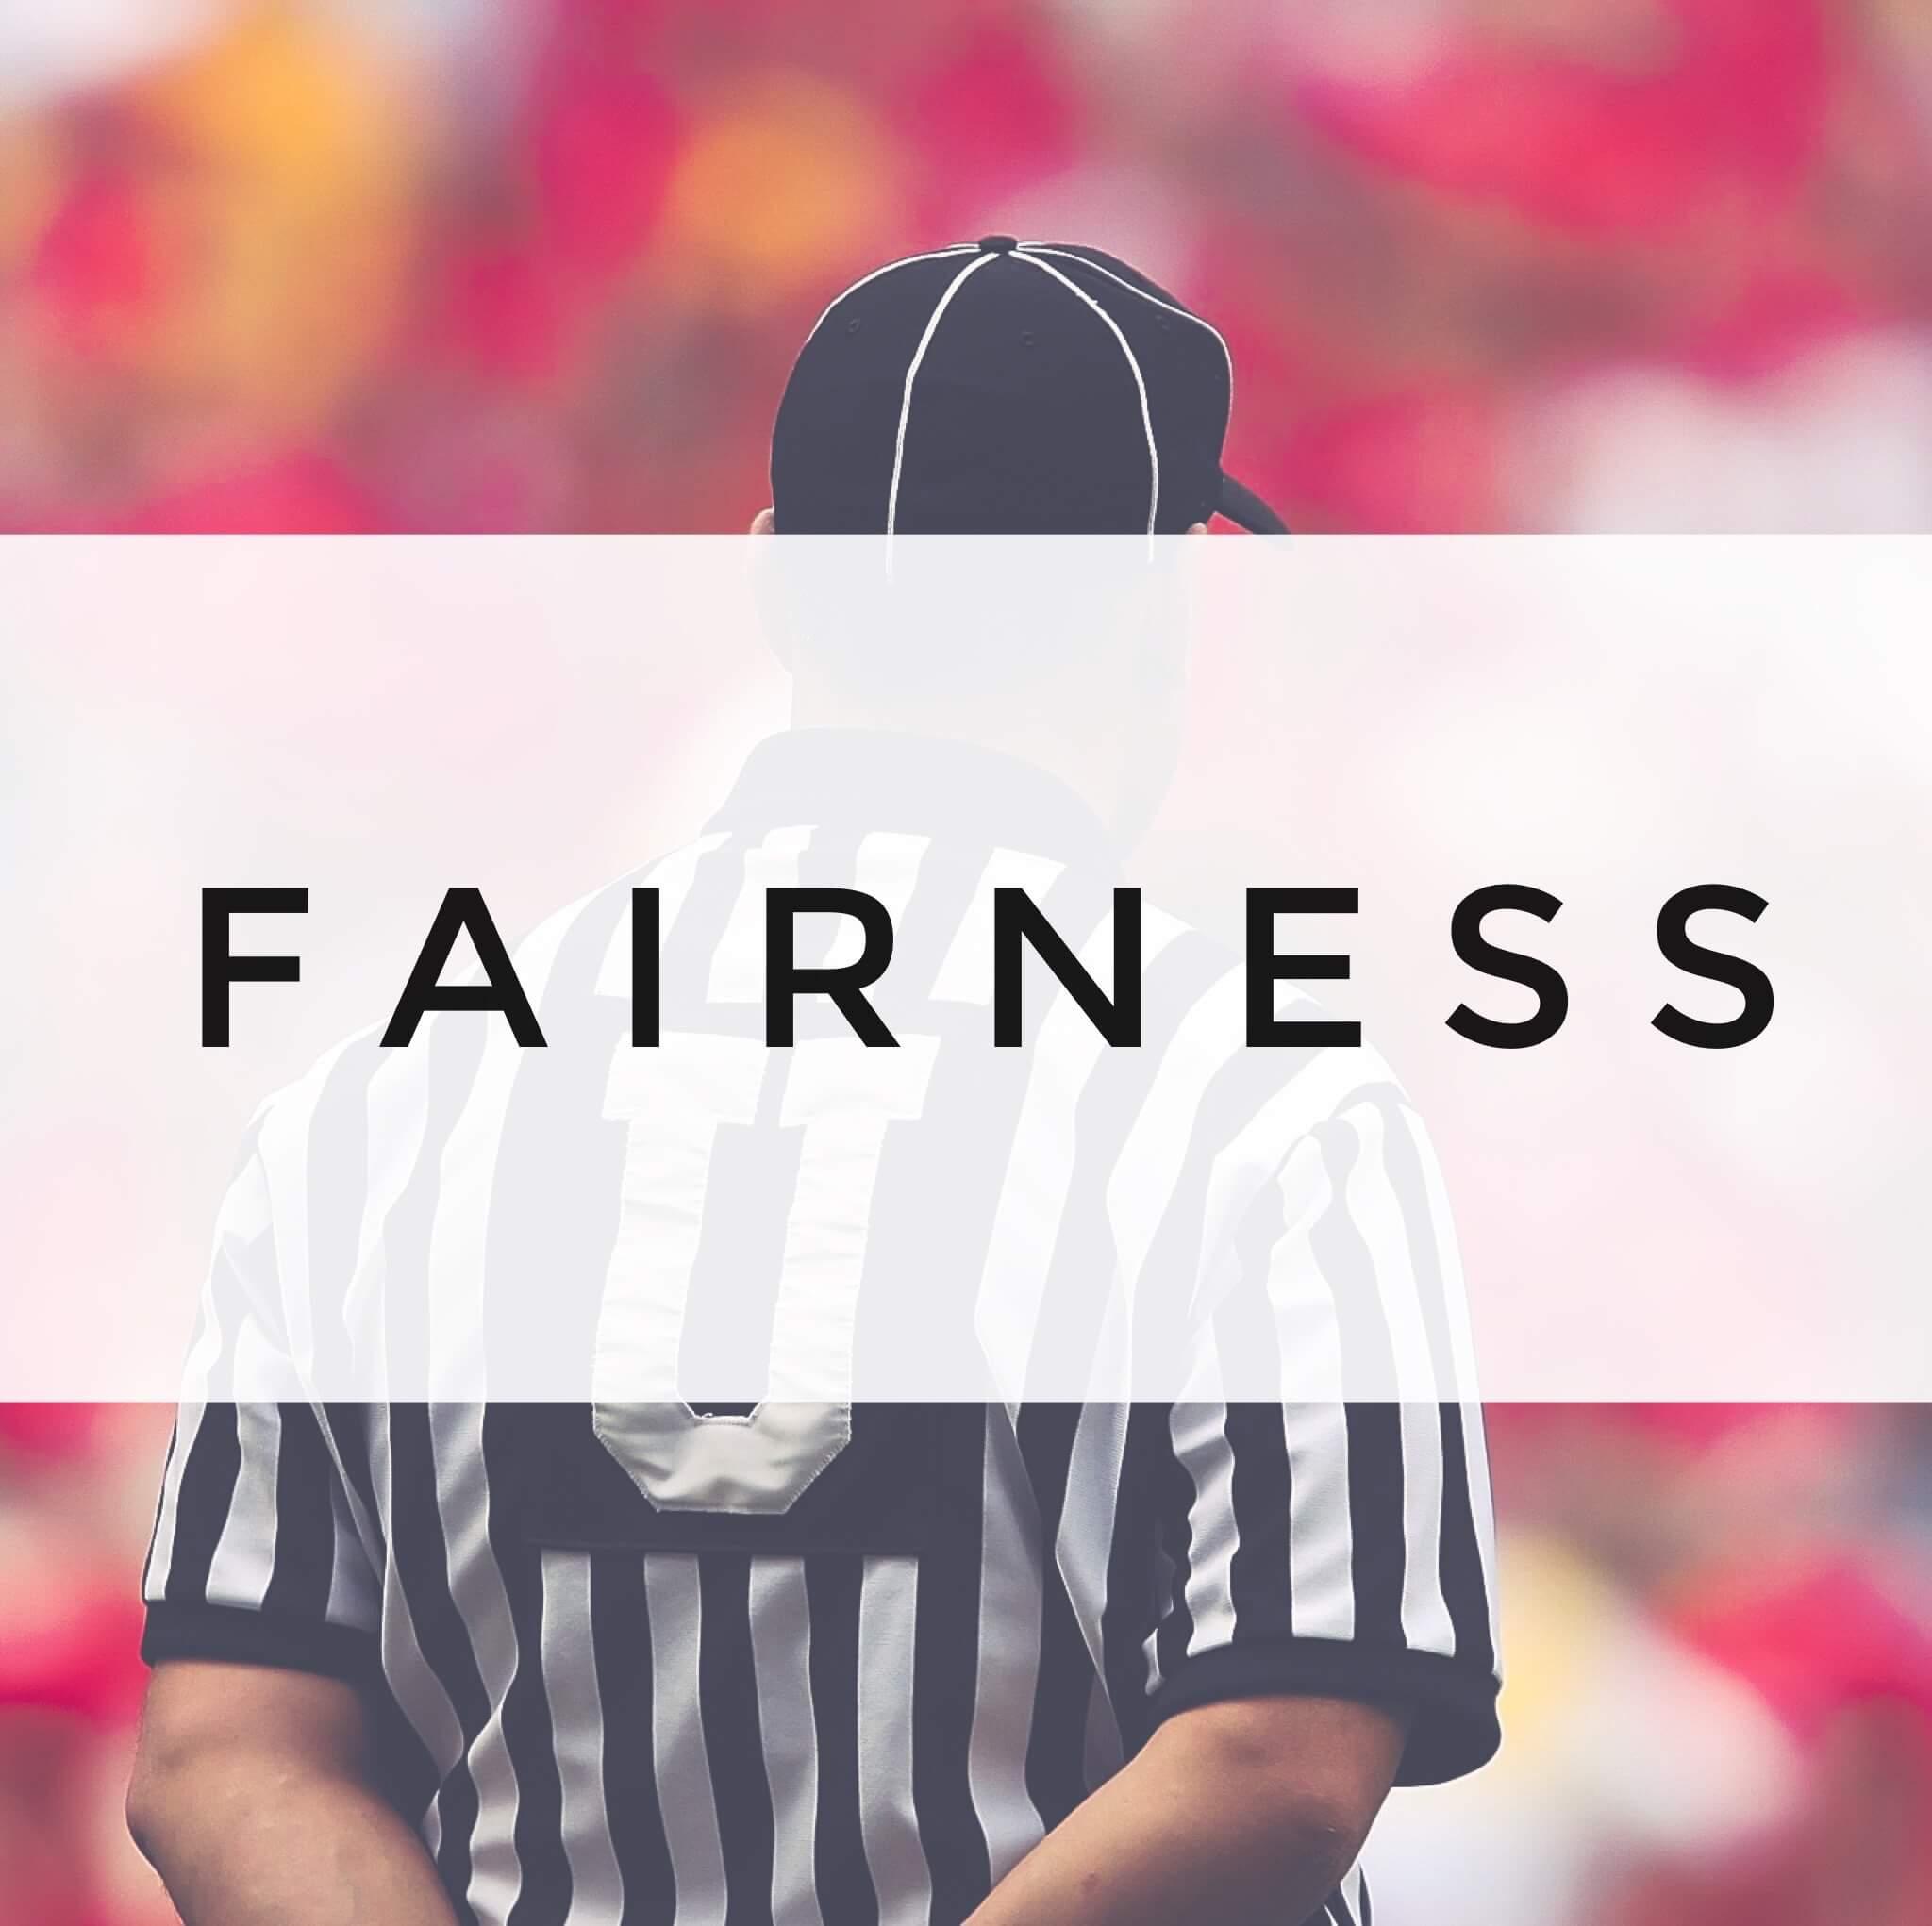 Fairness | Strength | Signature Justice